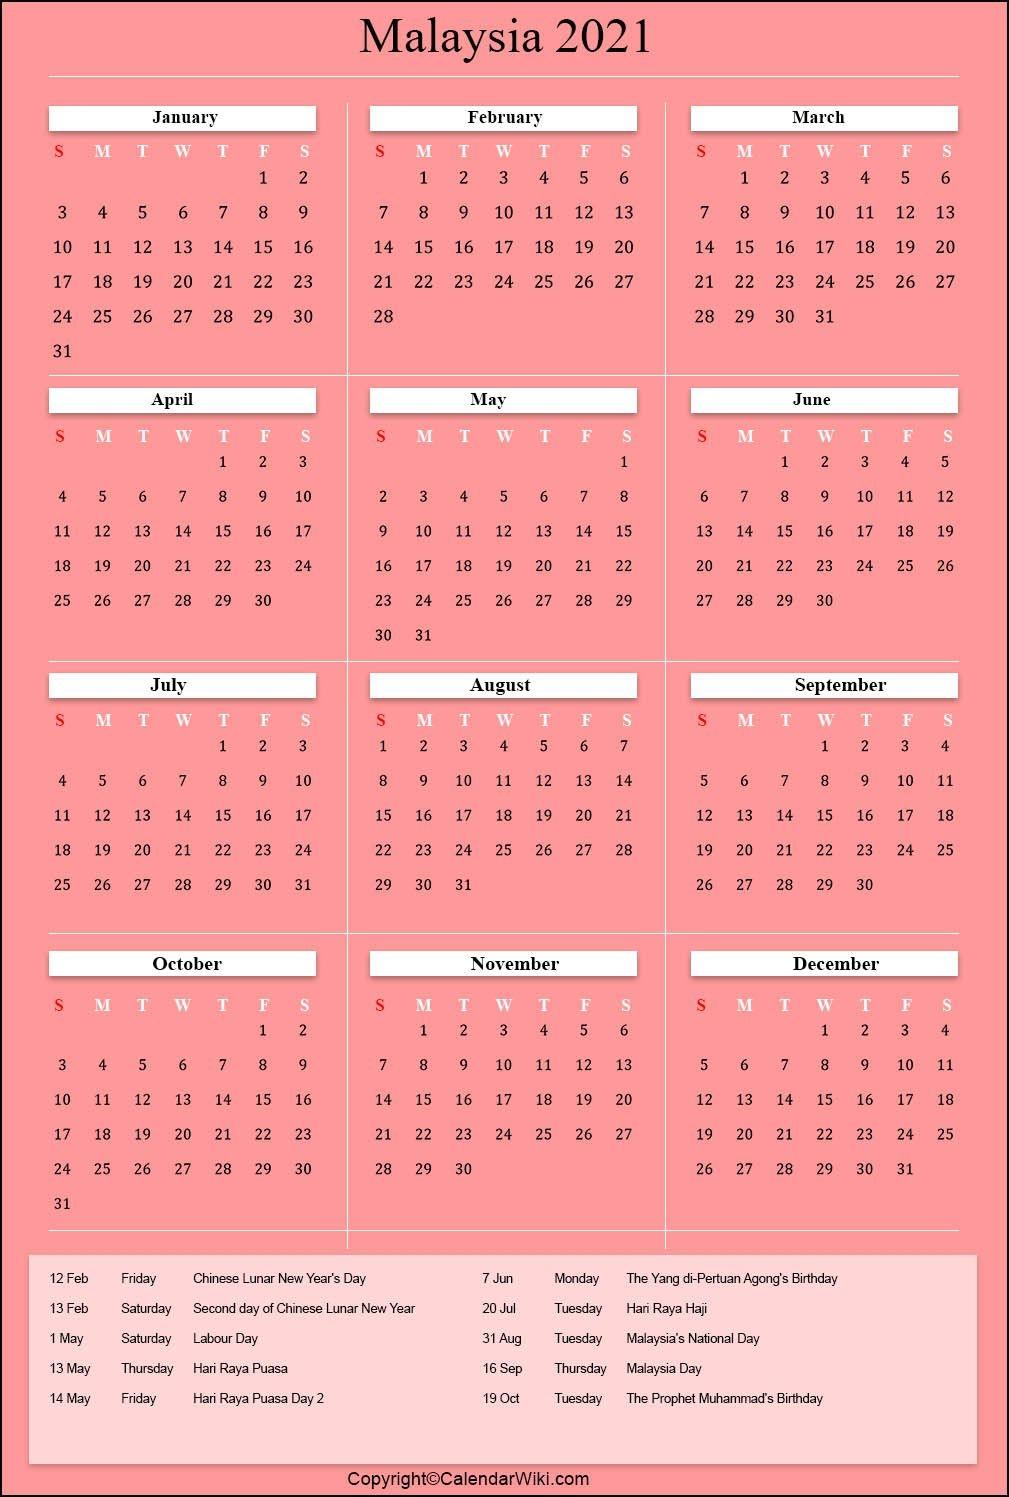 Public Holidays In Malaysia 2022